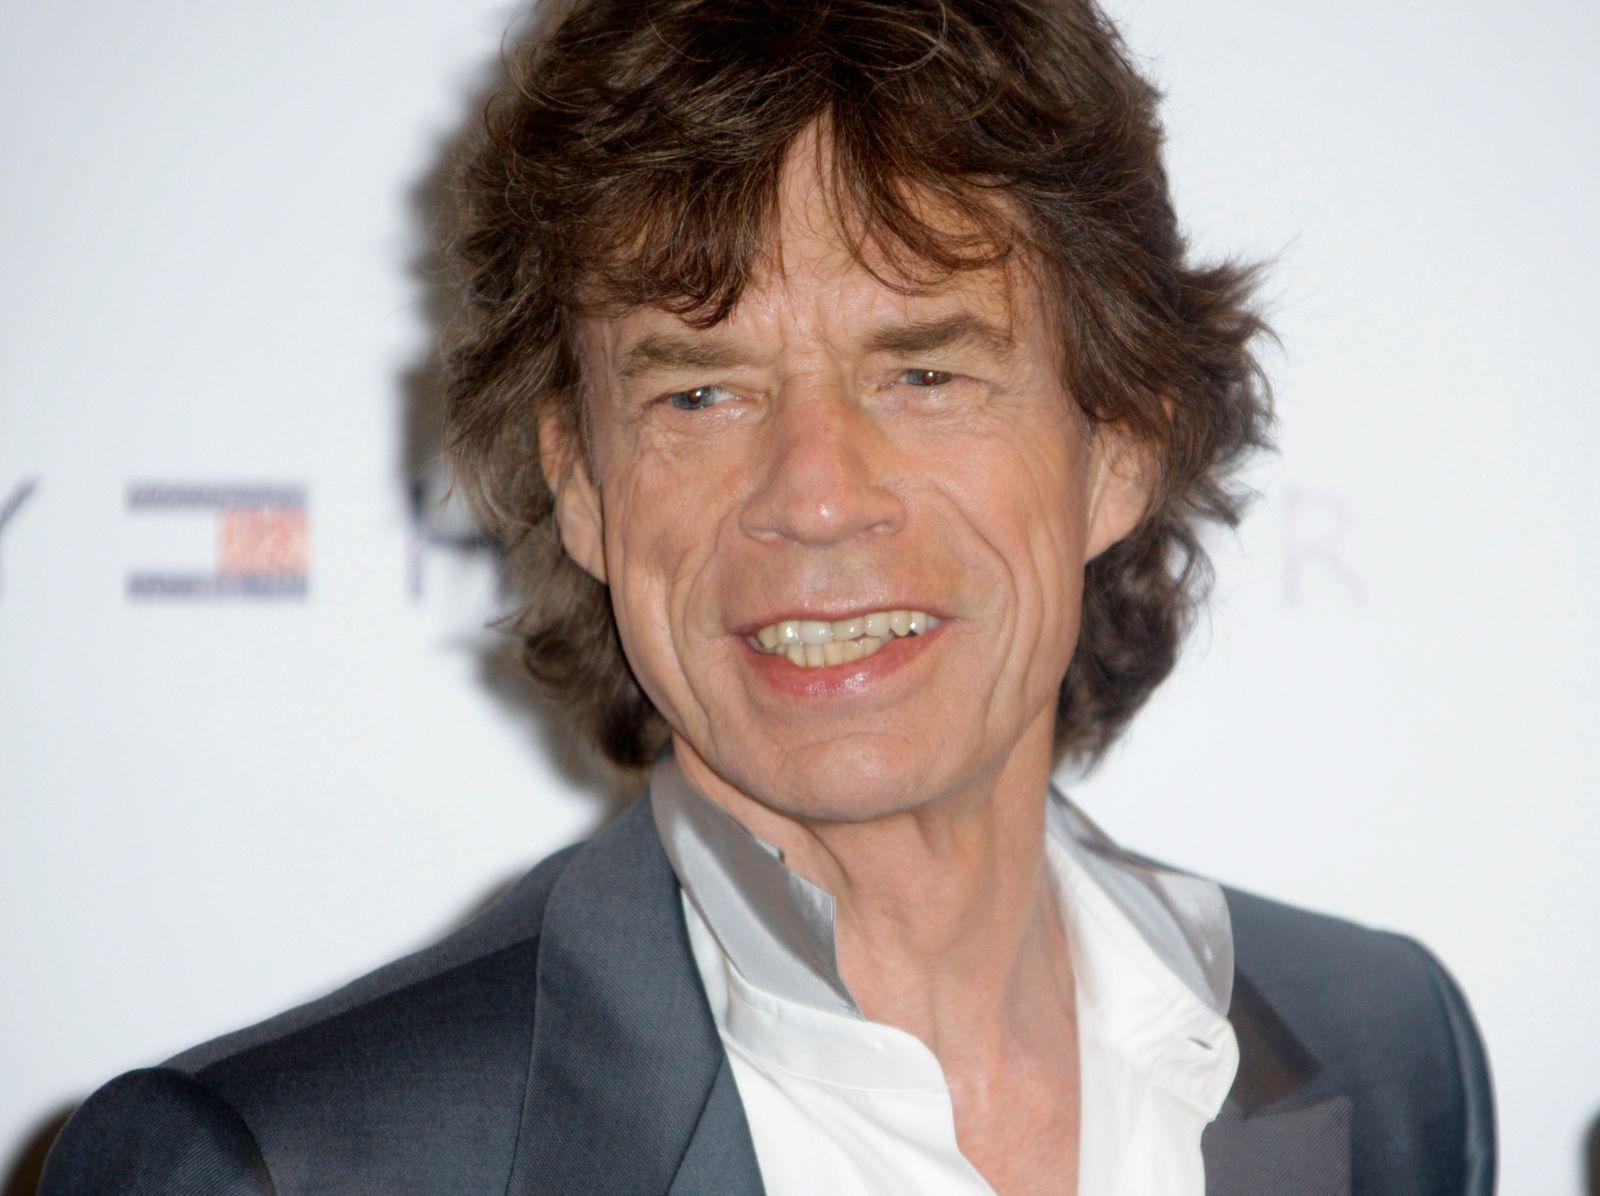 Filmfestival Cannes / Mick Jagger